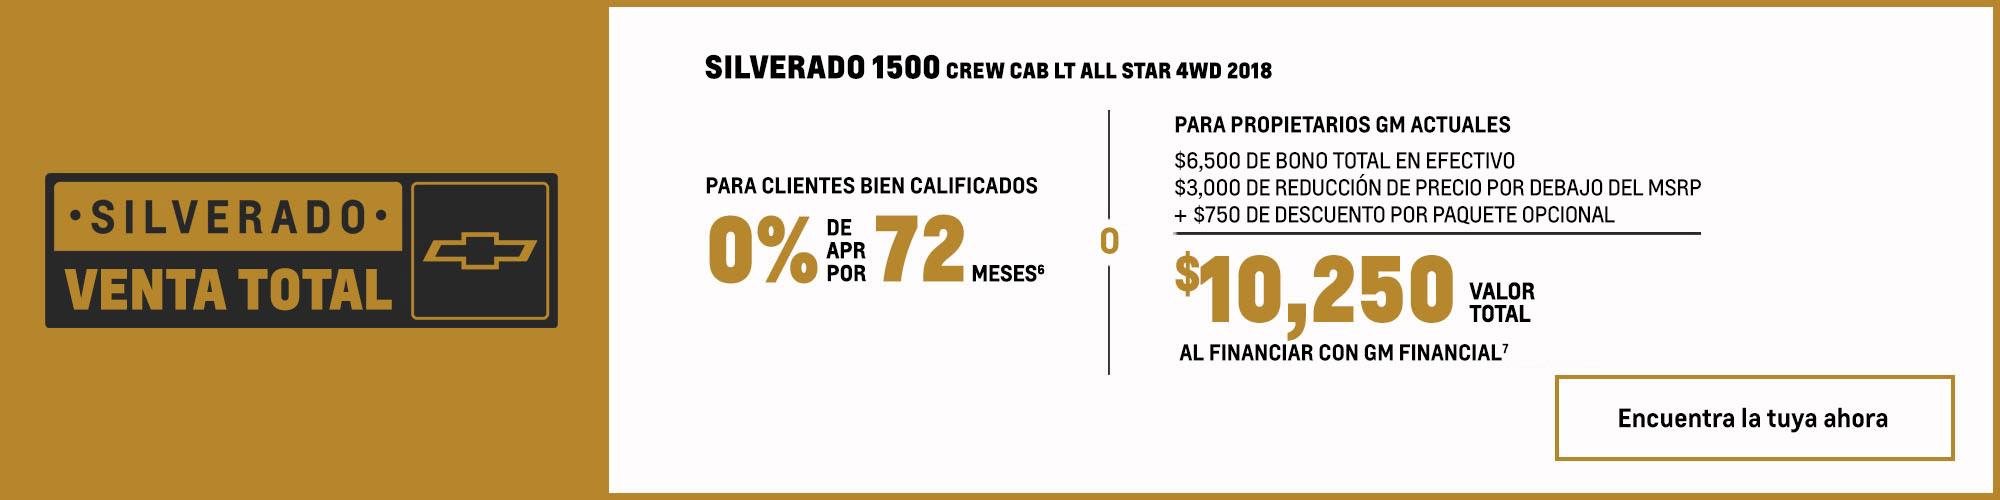 Chevrolet Silverado 1500 2018: 0% APR por 72 meses